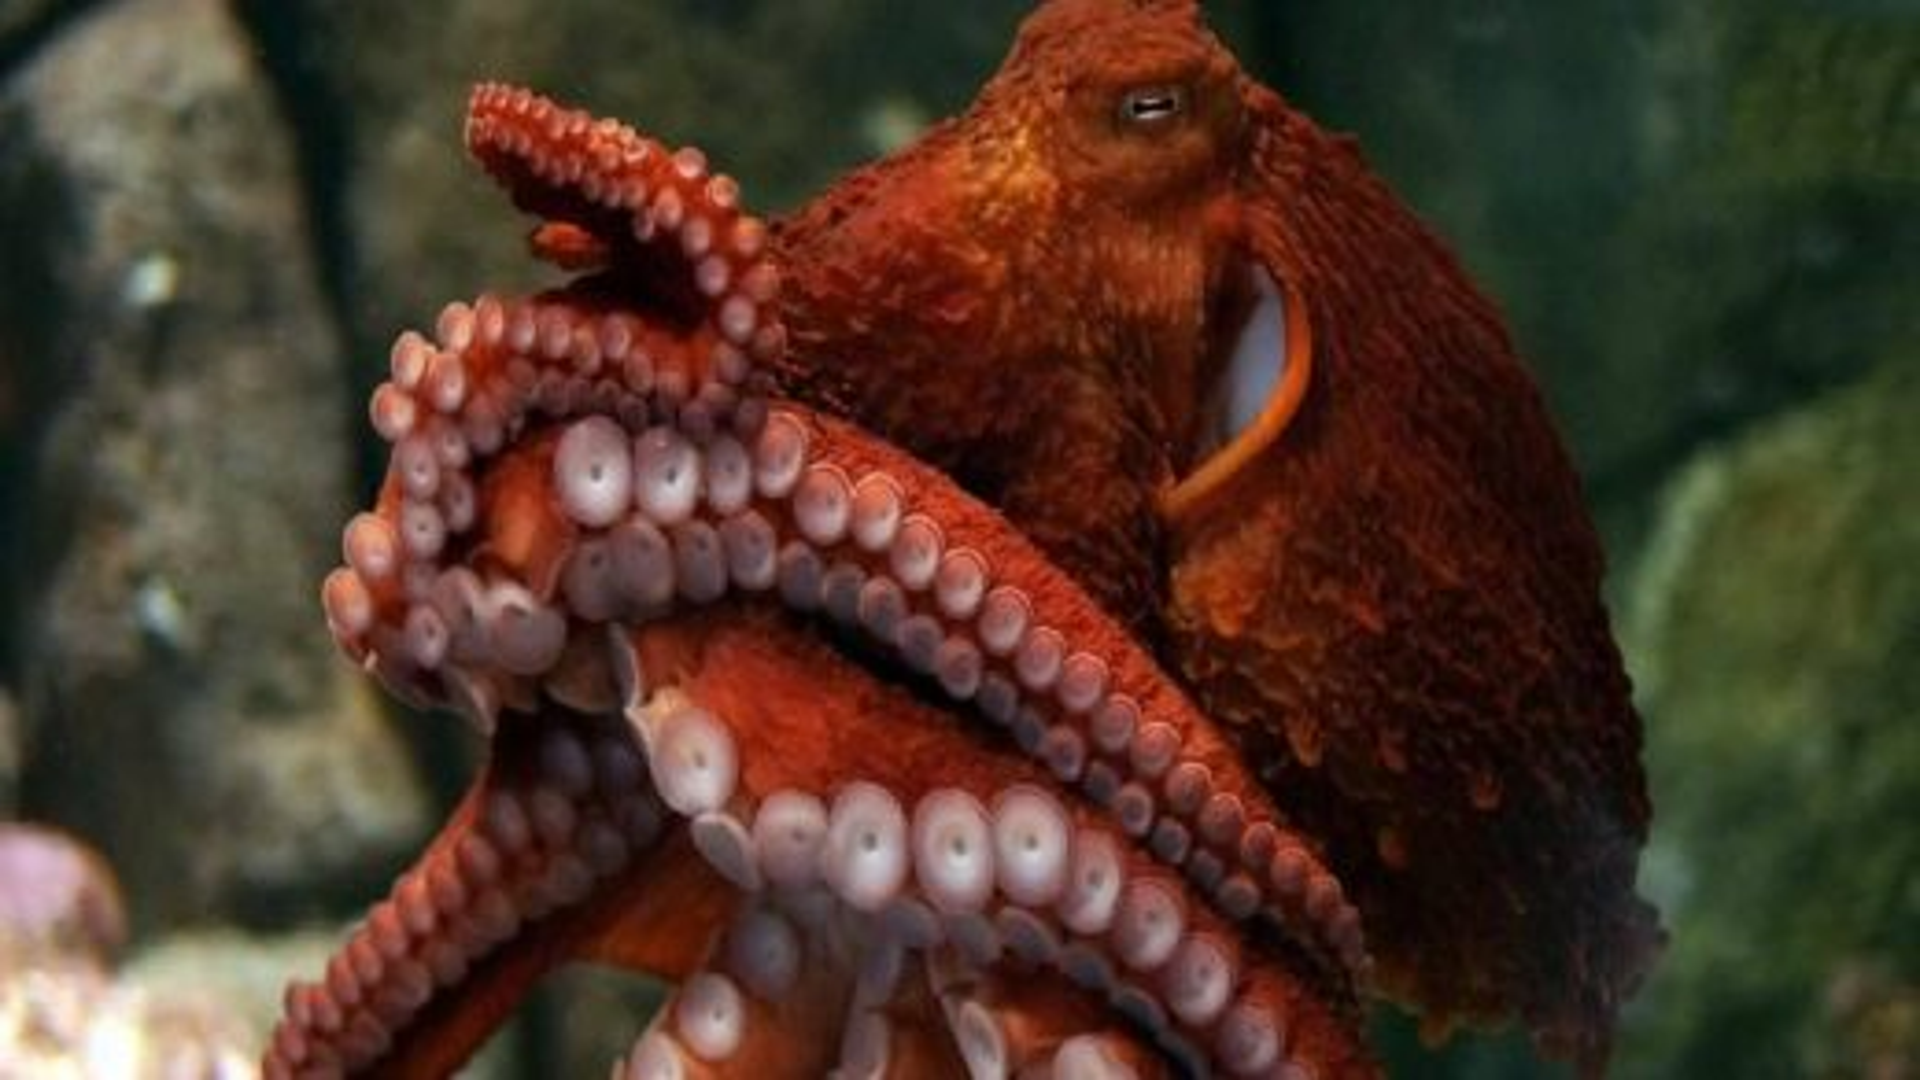 اختاپوس اقیانوس آرام | تگ